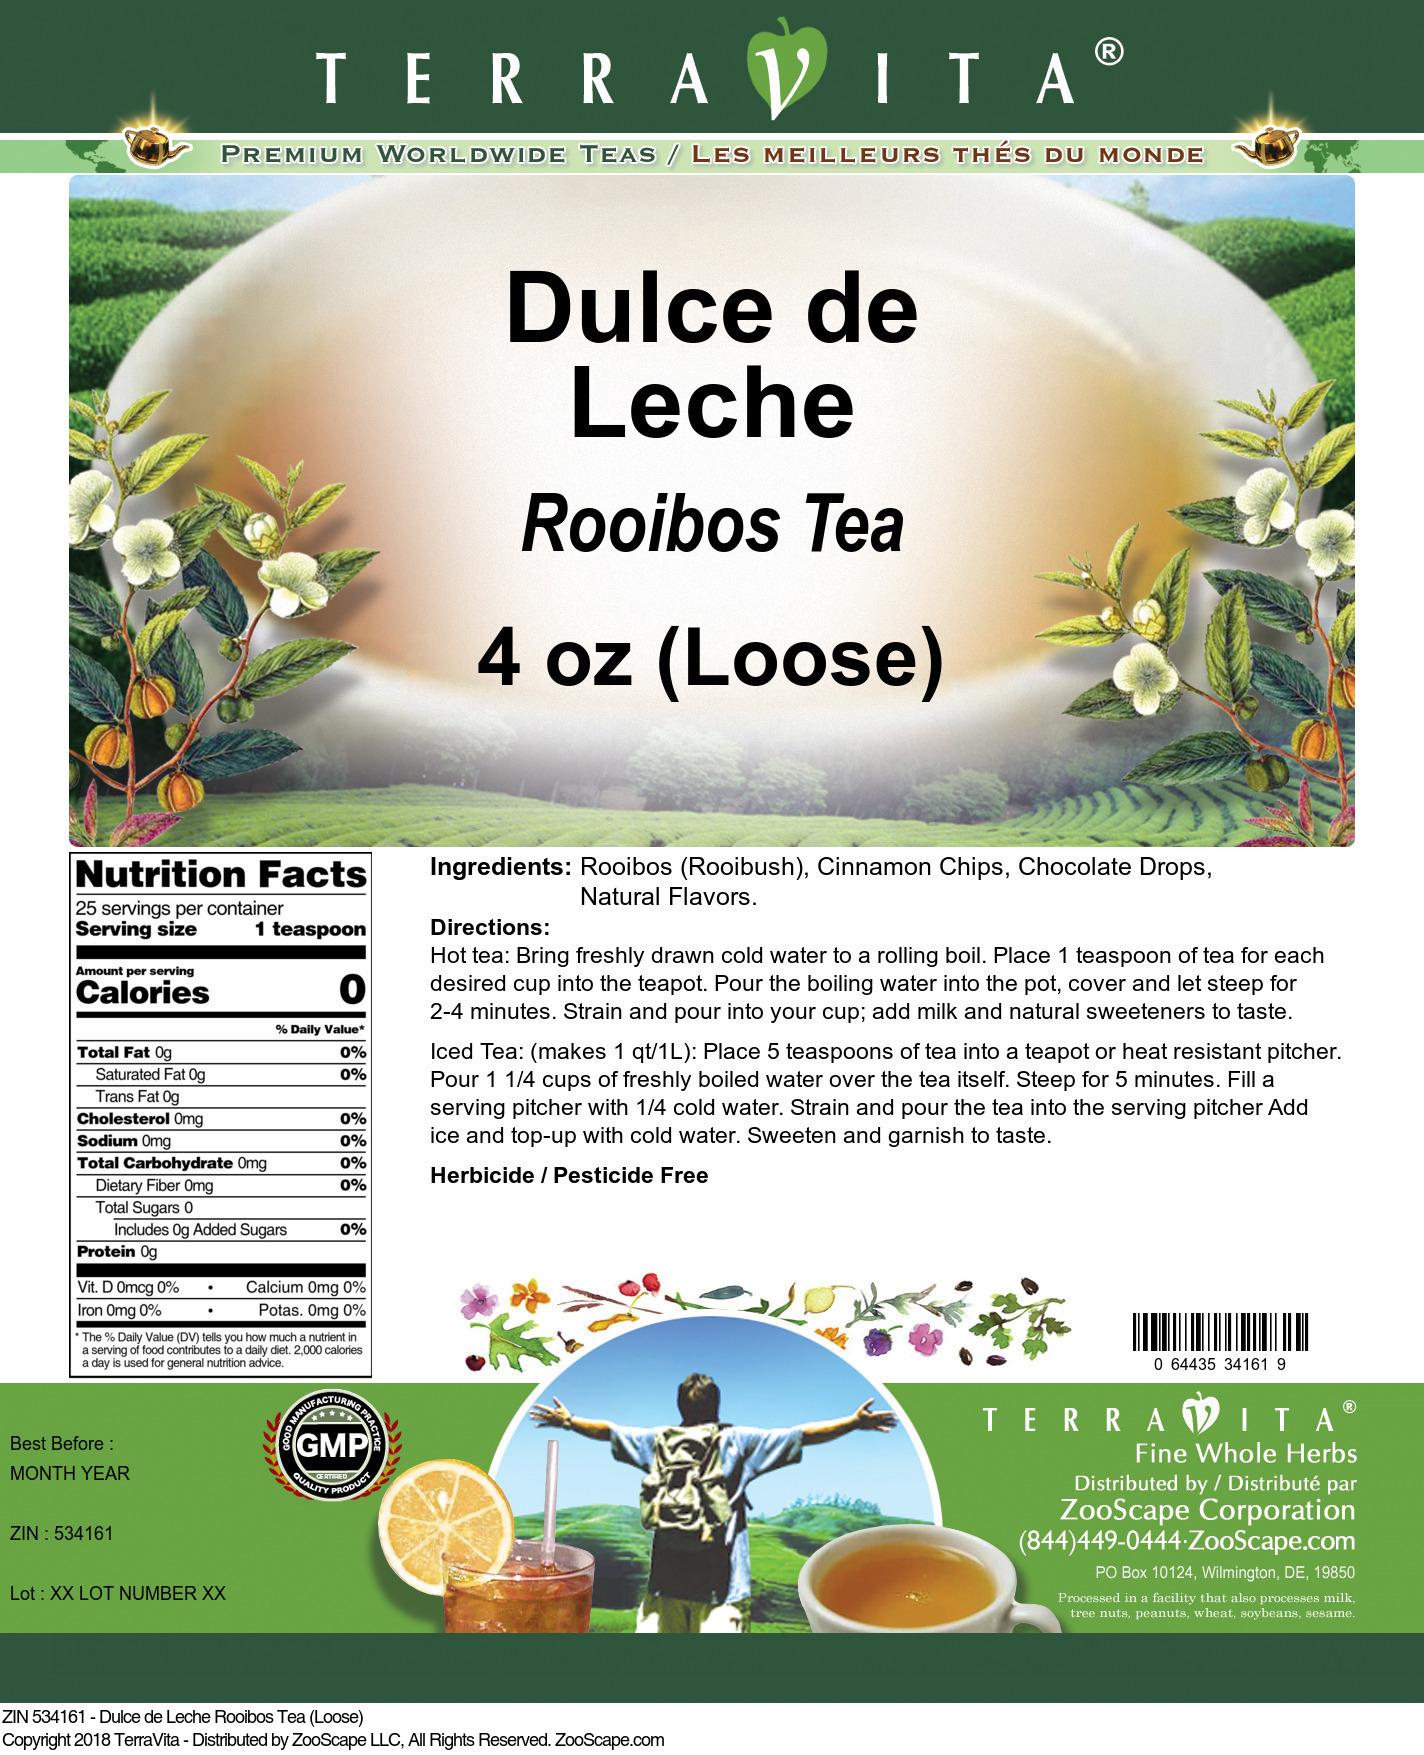 Dulce de Leche Rooibos Tea